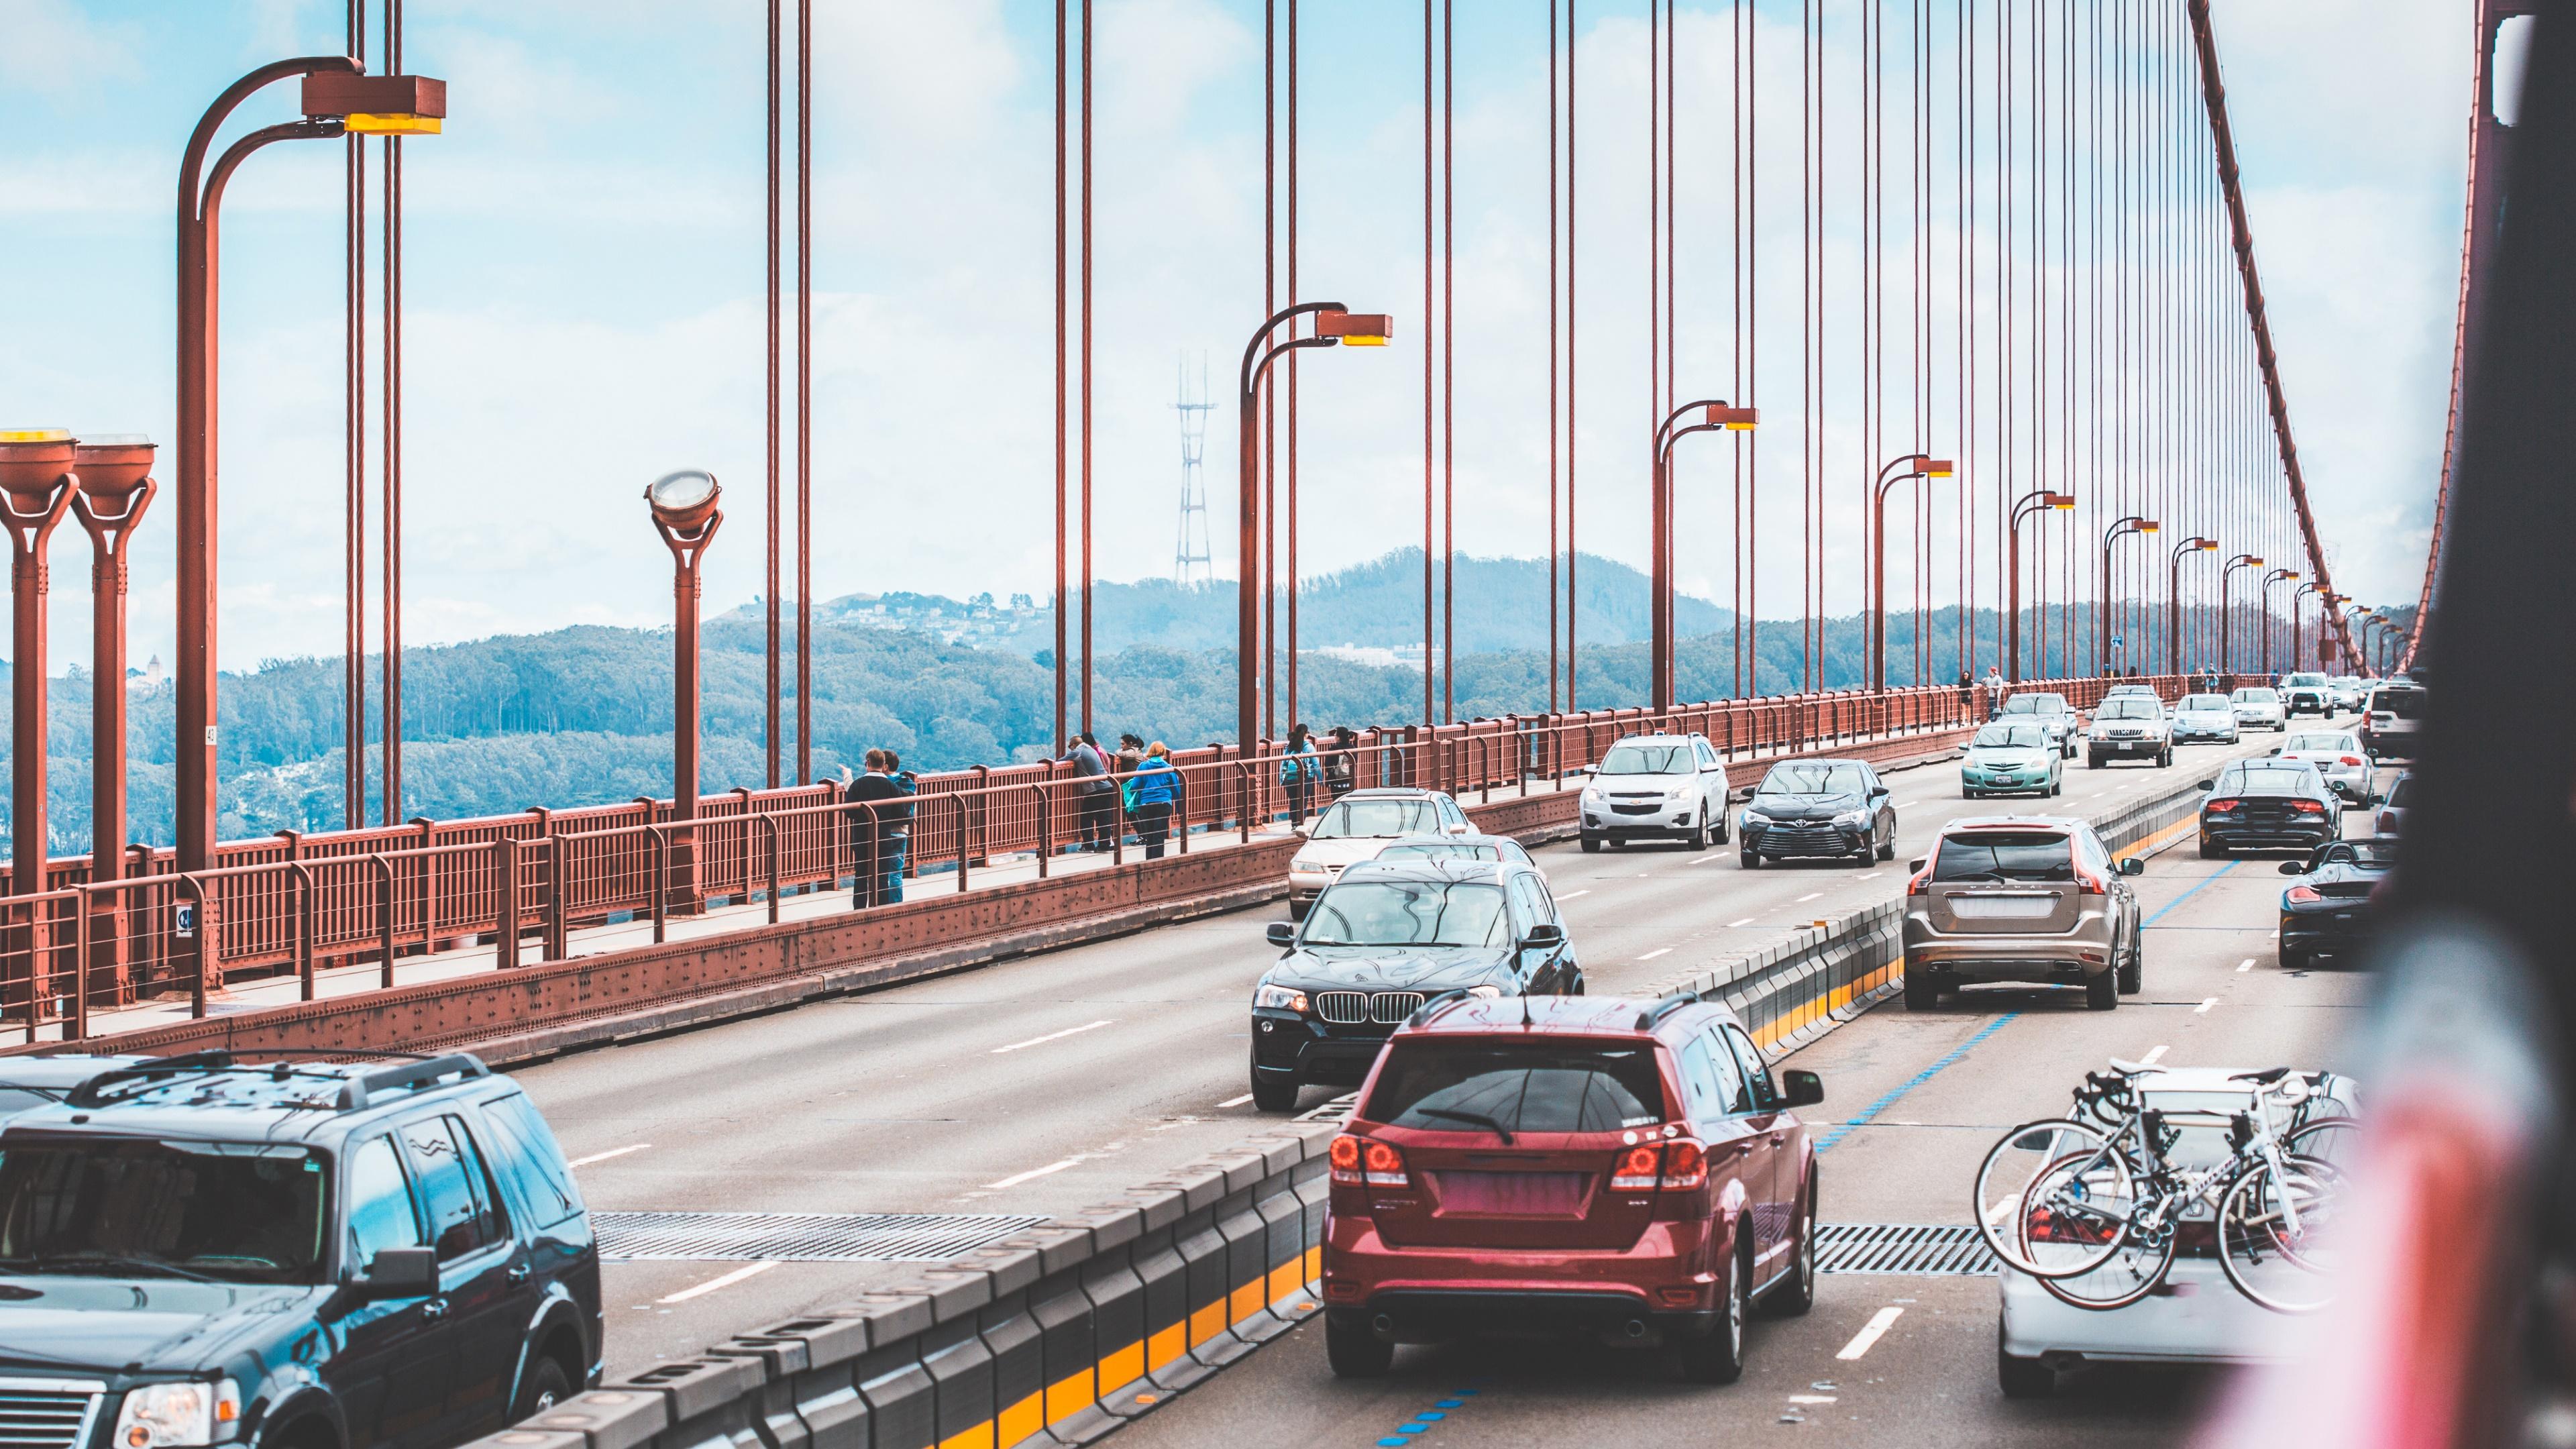 Driving acros the Golden Gate Bridge wallpaper